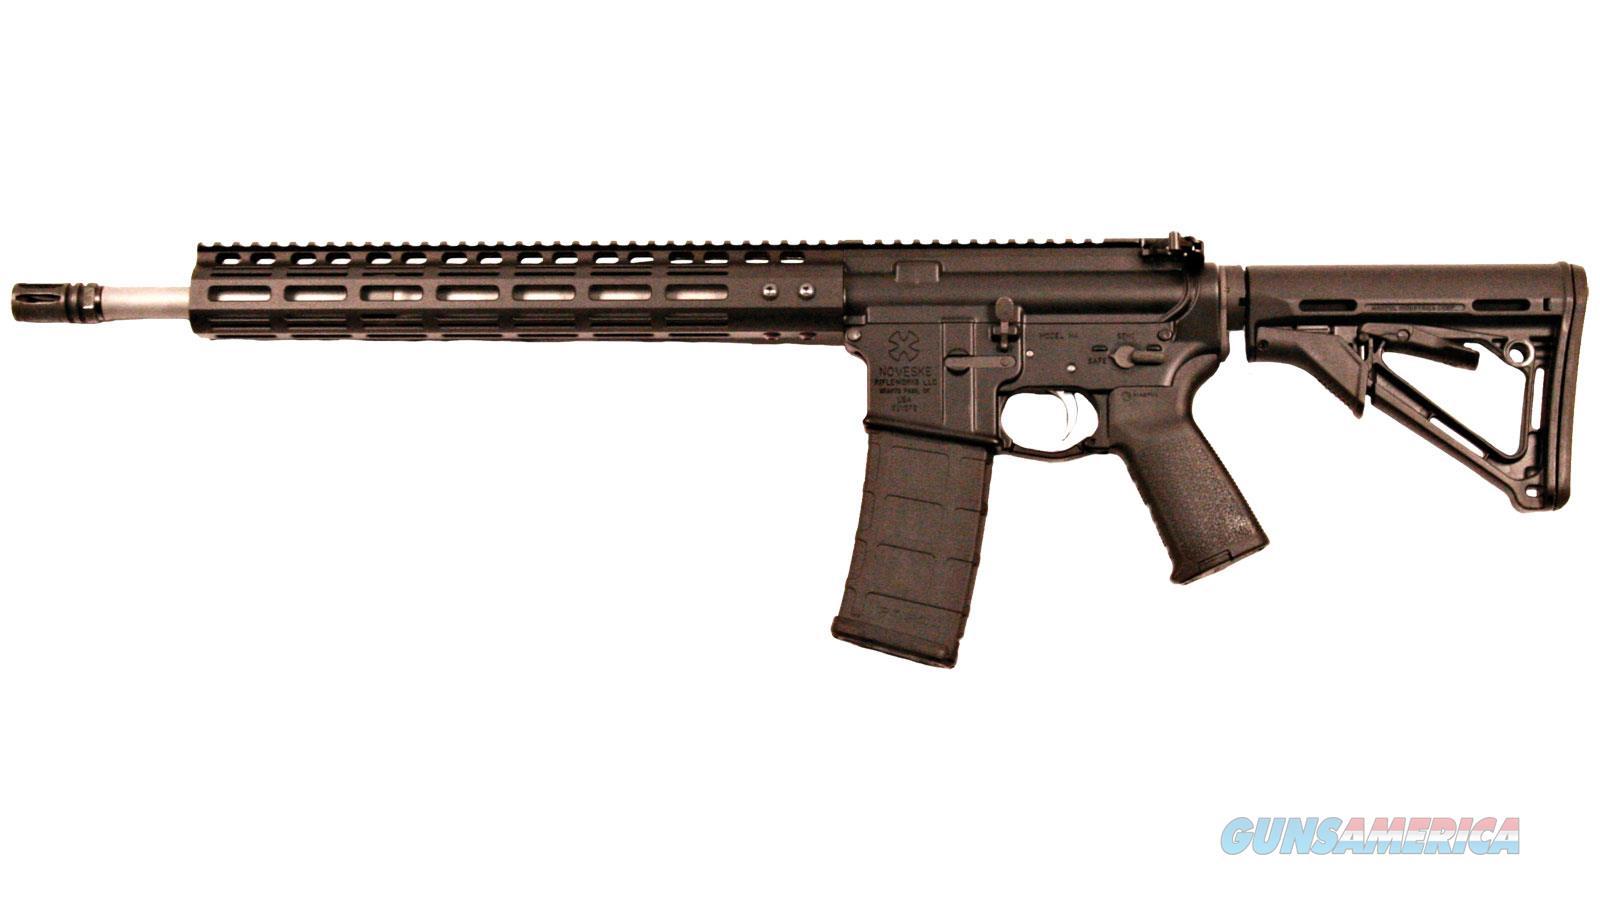 "Noveske Rifleworks Llc Gen1 Rogue Hunter 5.56Mm 30Rd 16"" M-Lok Black 02000402  Guns > Rifles > MN Misc Rifles"